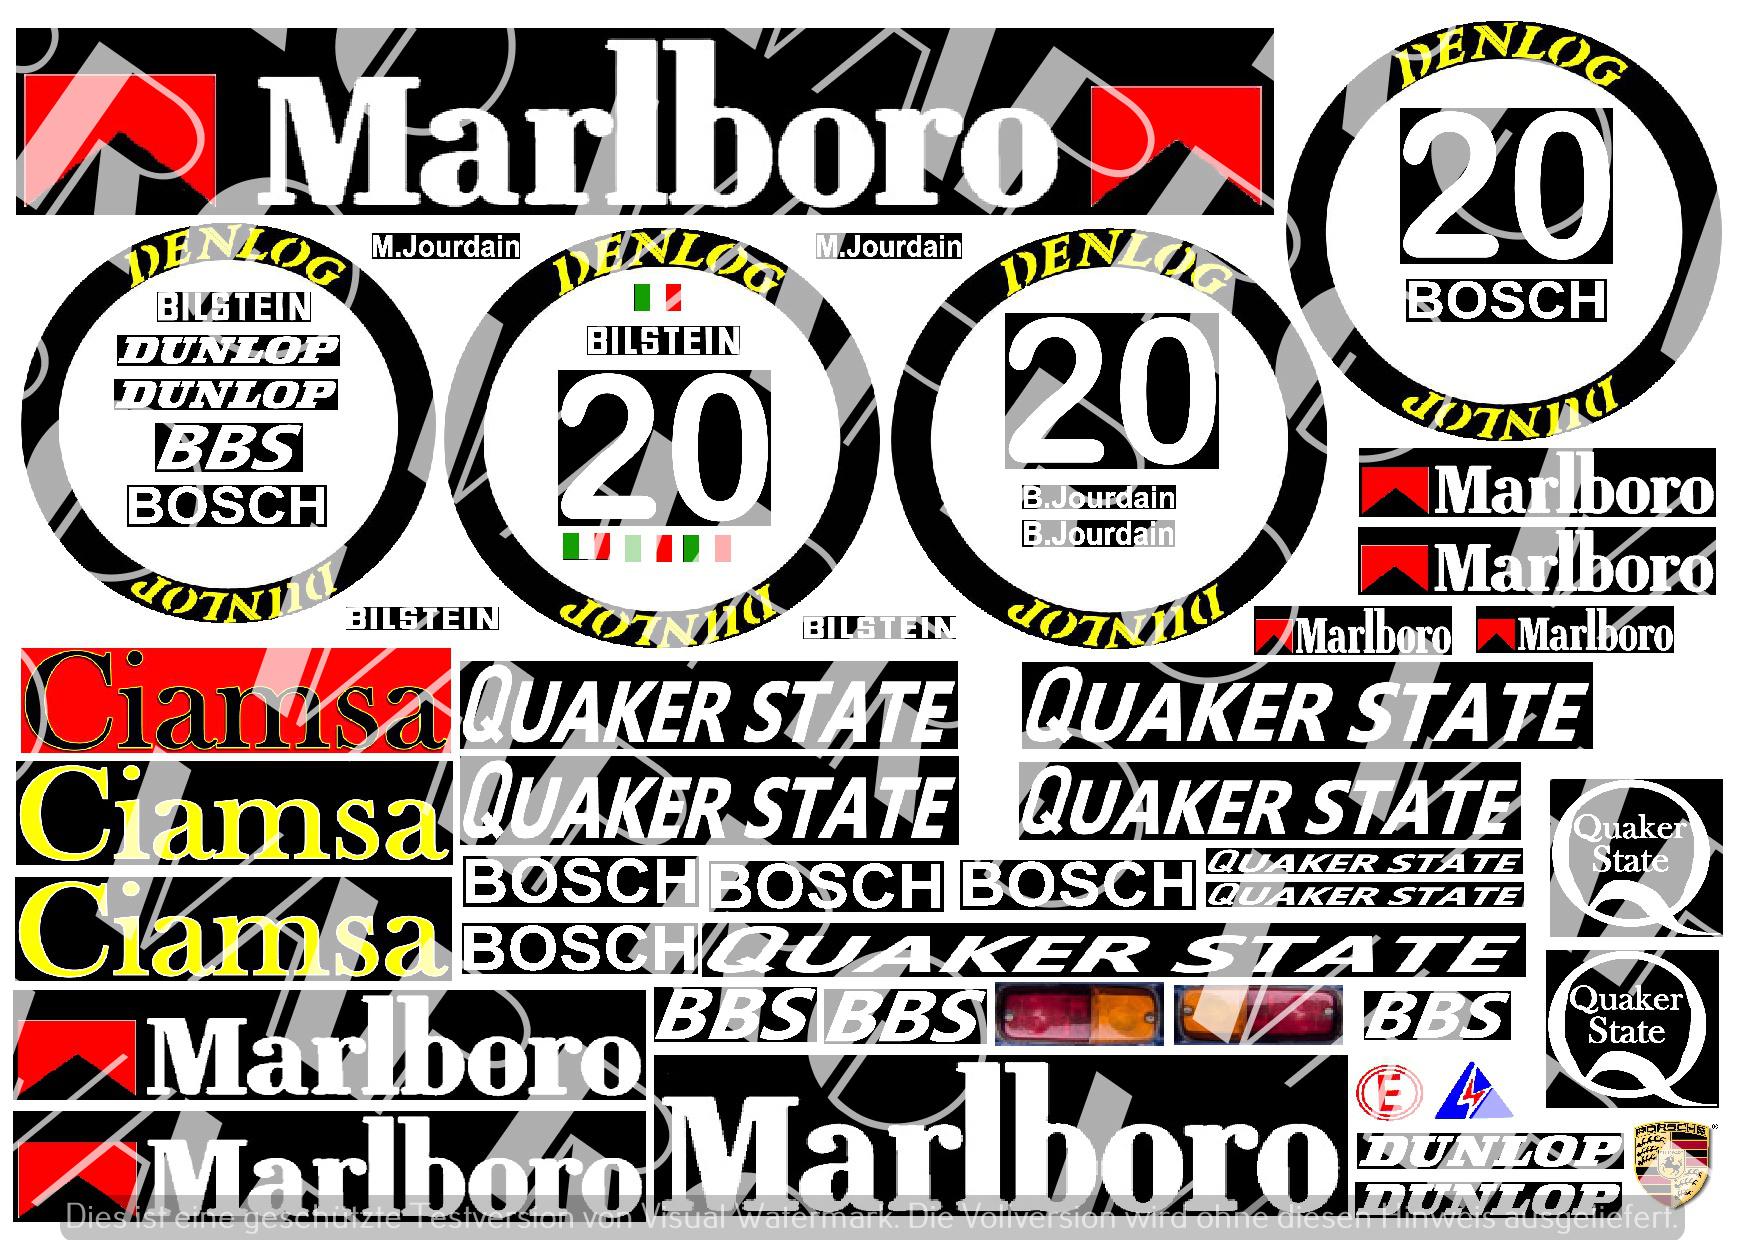 D-163 Black Marlboro